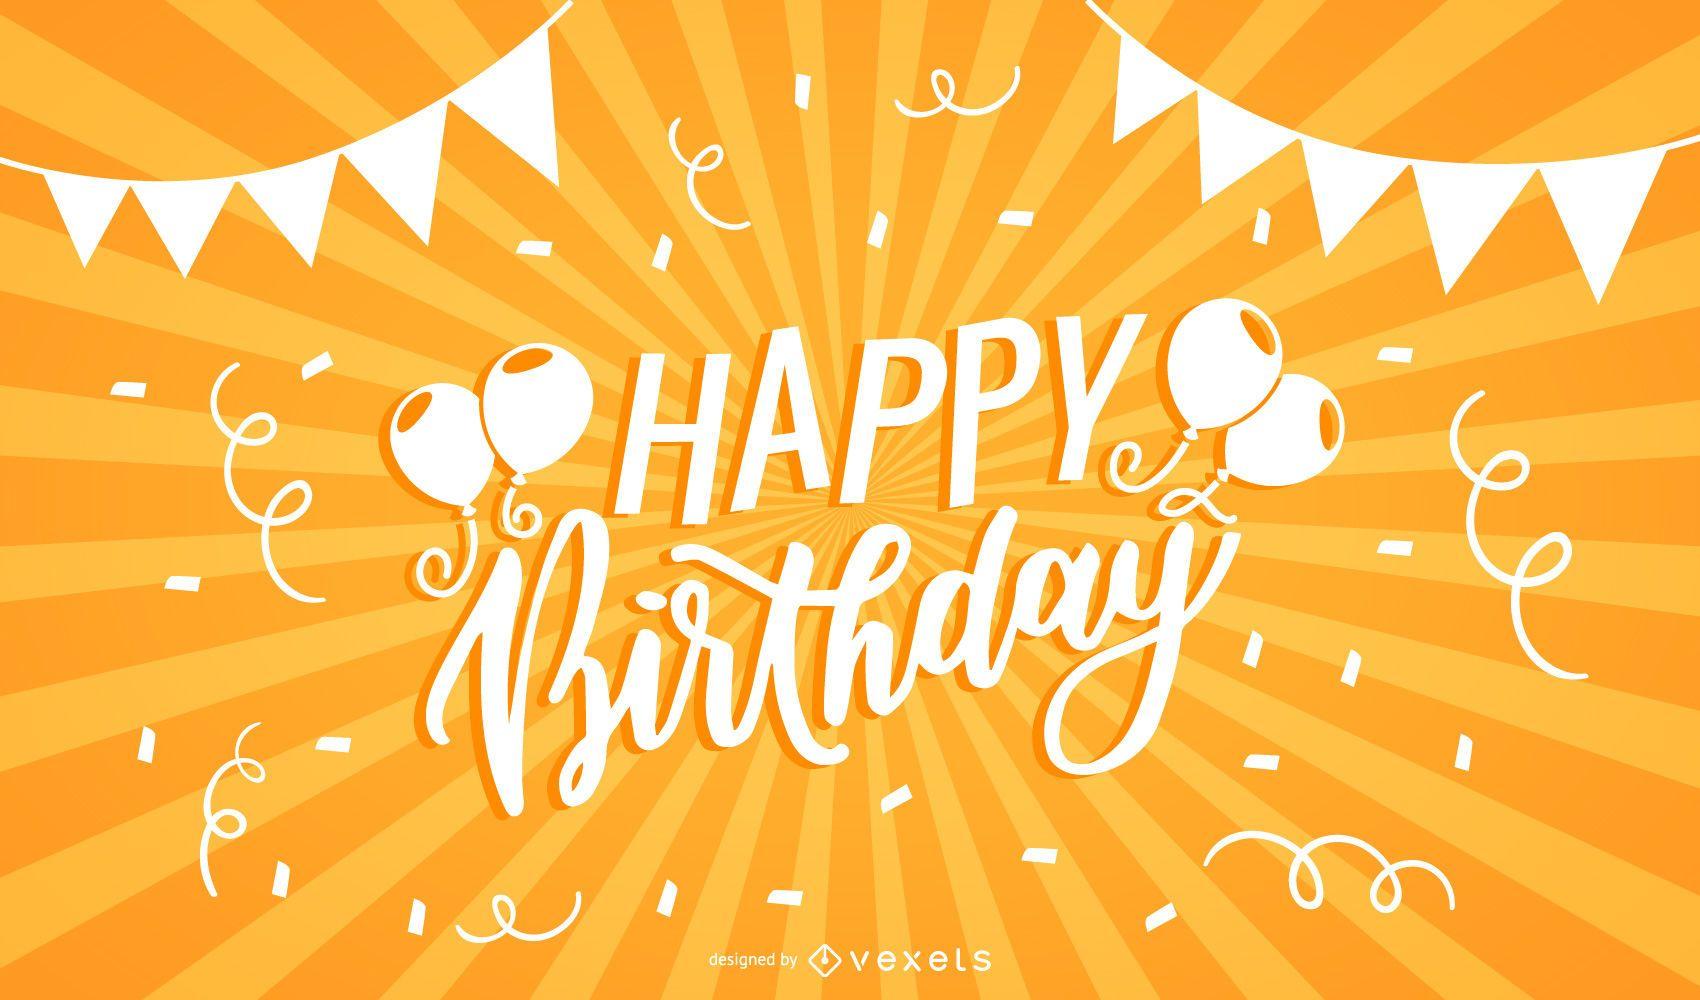 Happy Birthday Typography Sunbeam Background